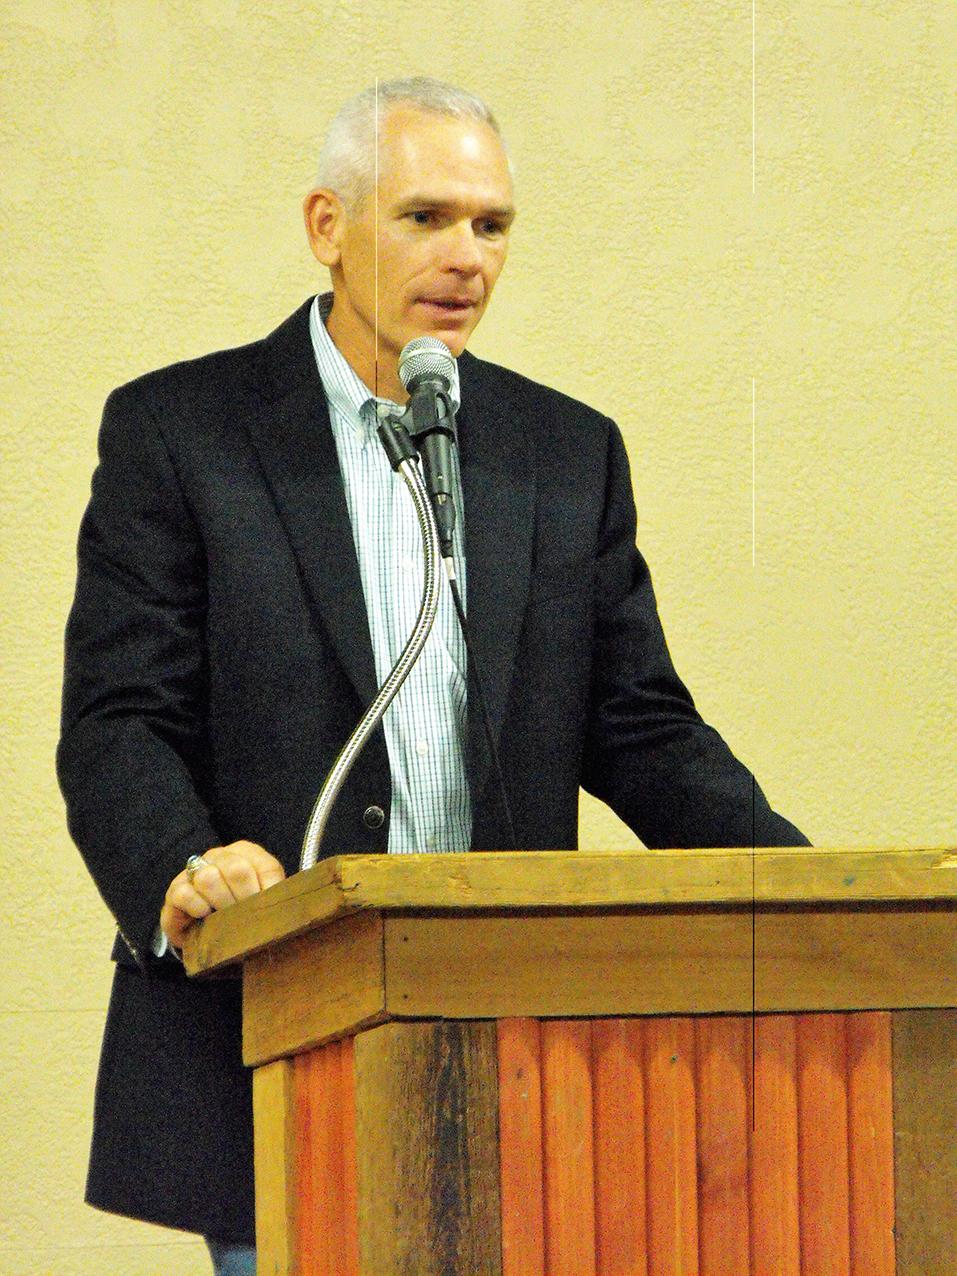 Stafford Retirement Mayor Kenny Weldon